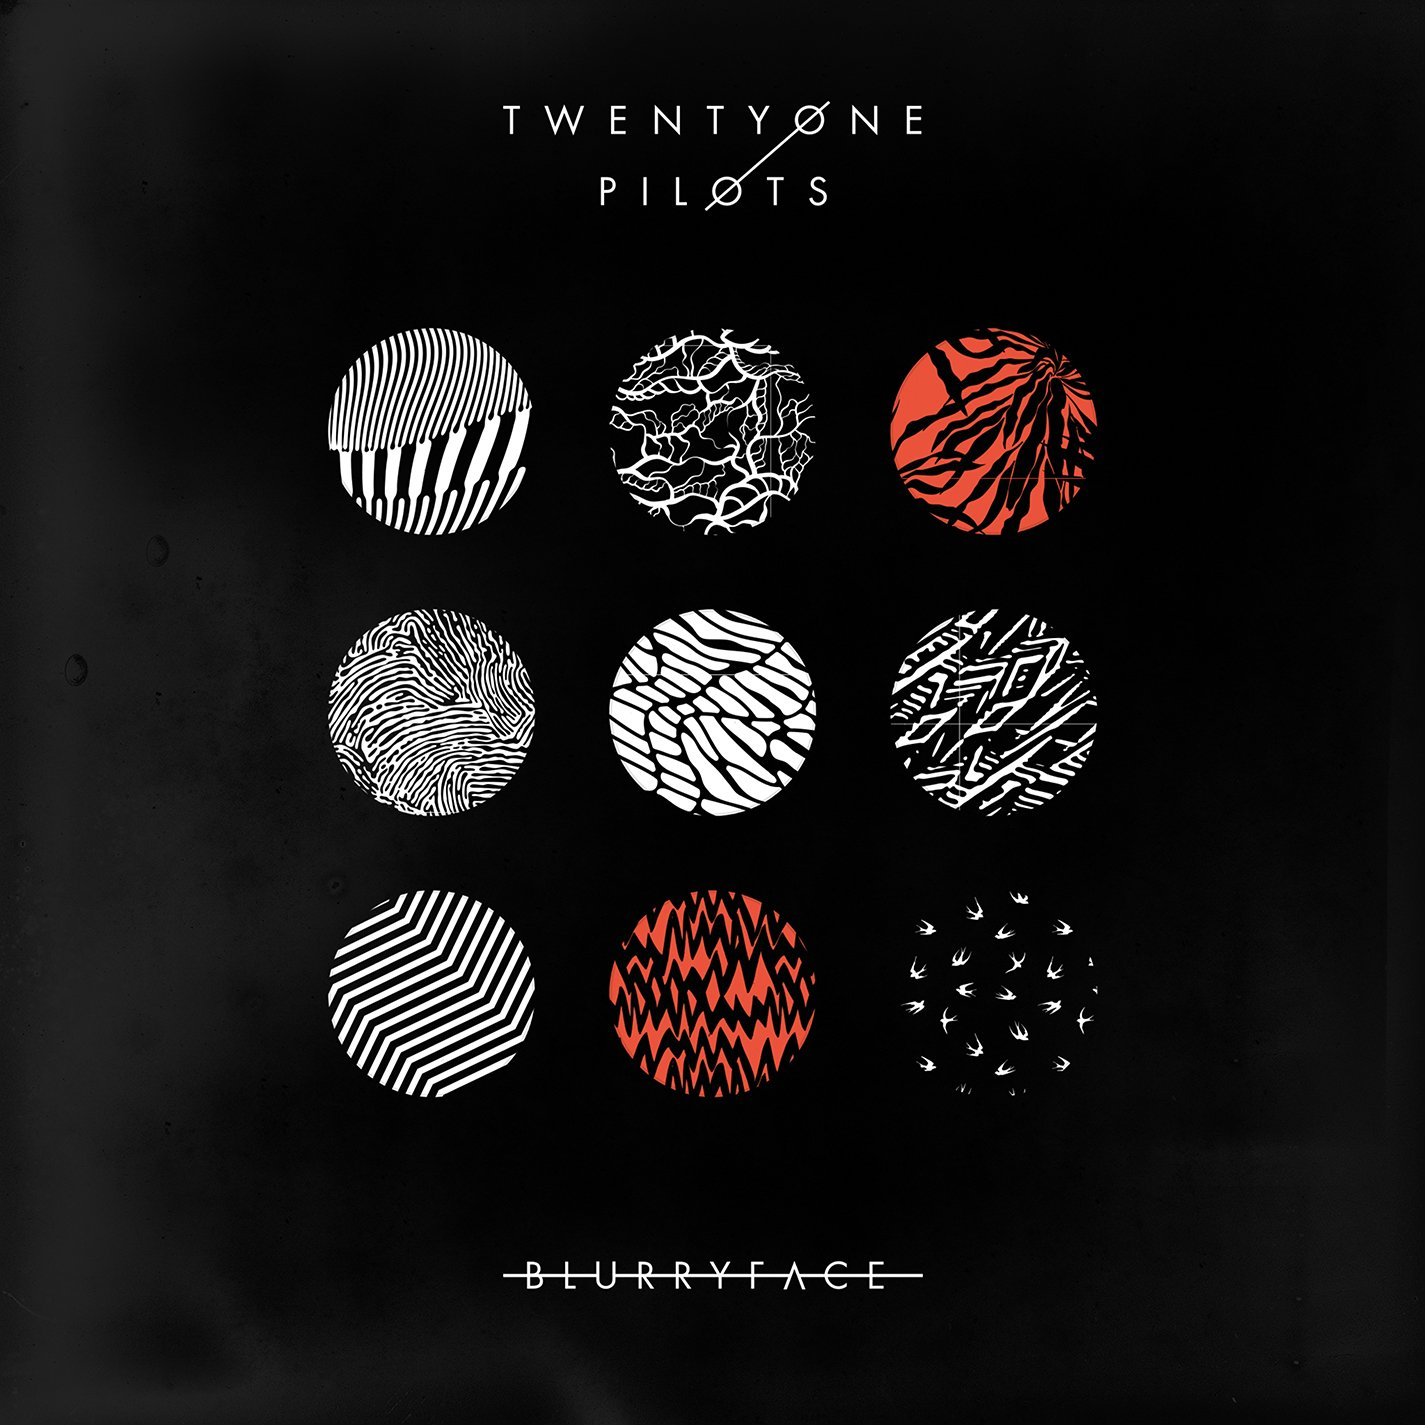 CD : Twenty One Pilots - Blurryface (CD)